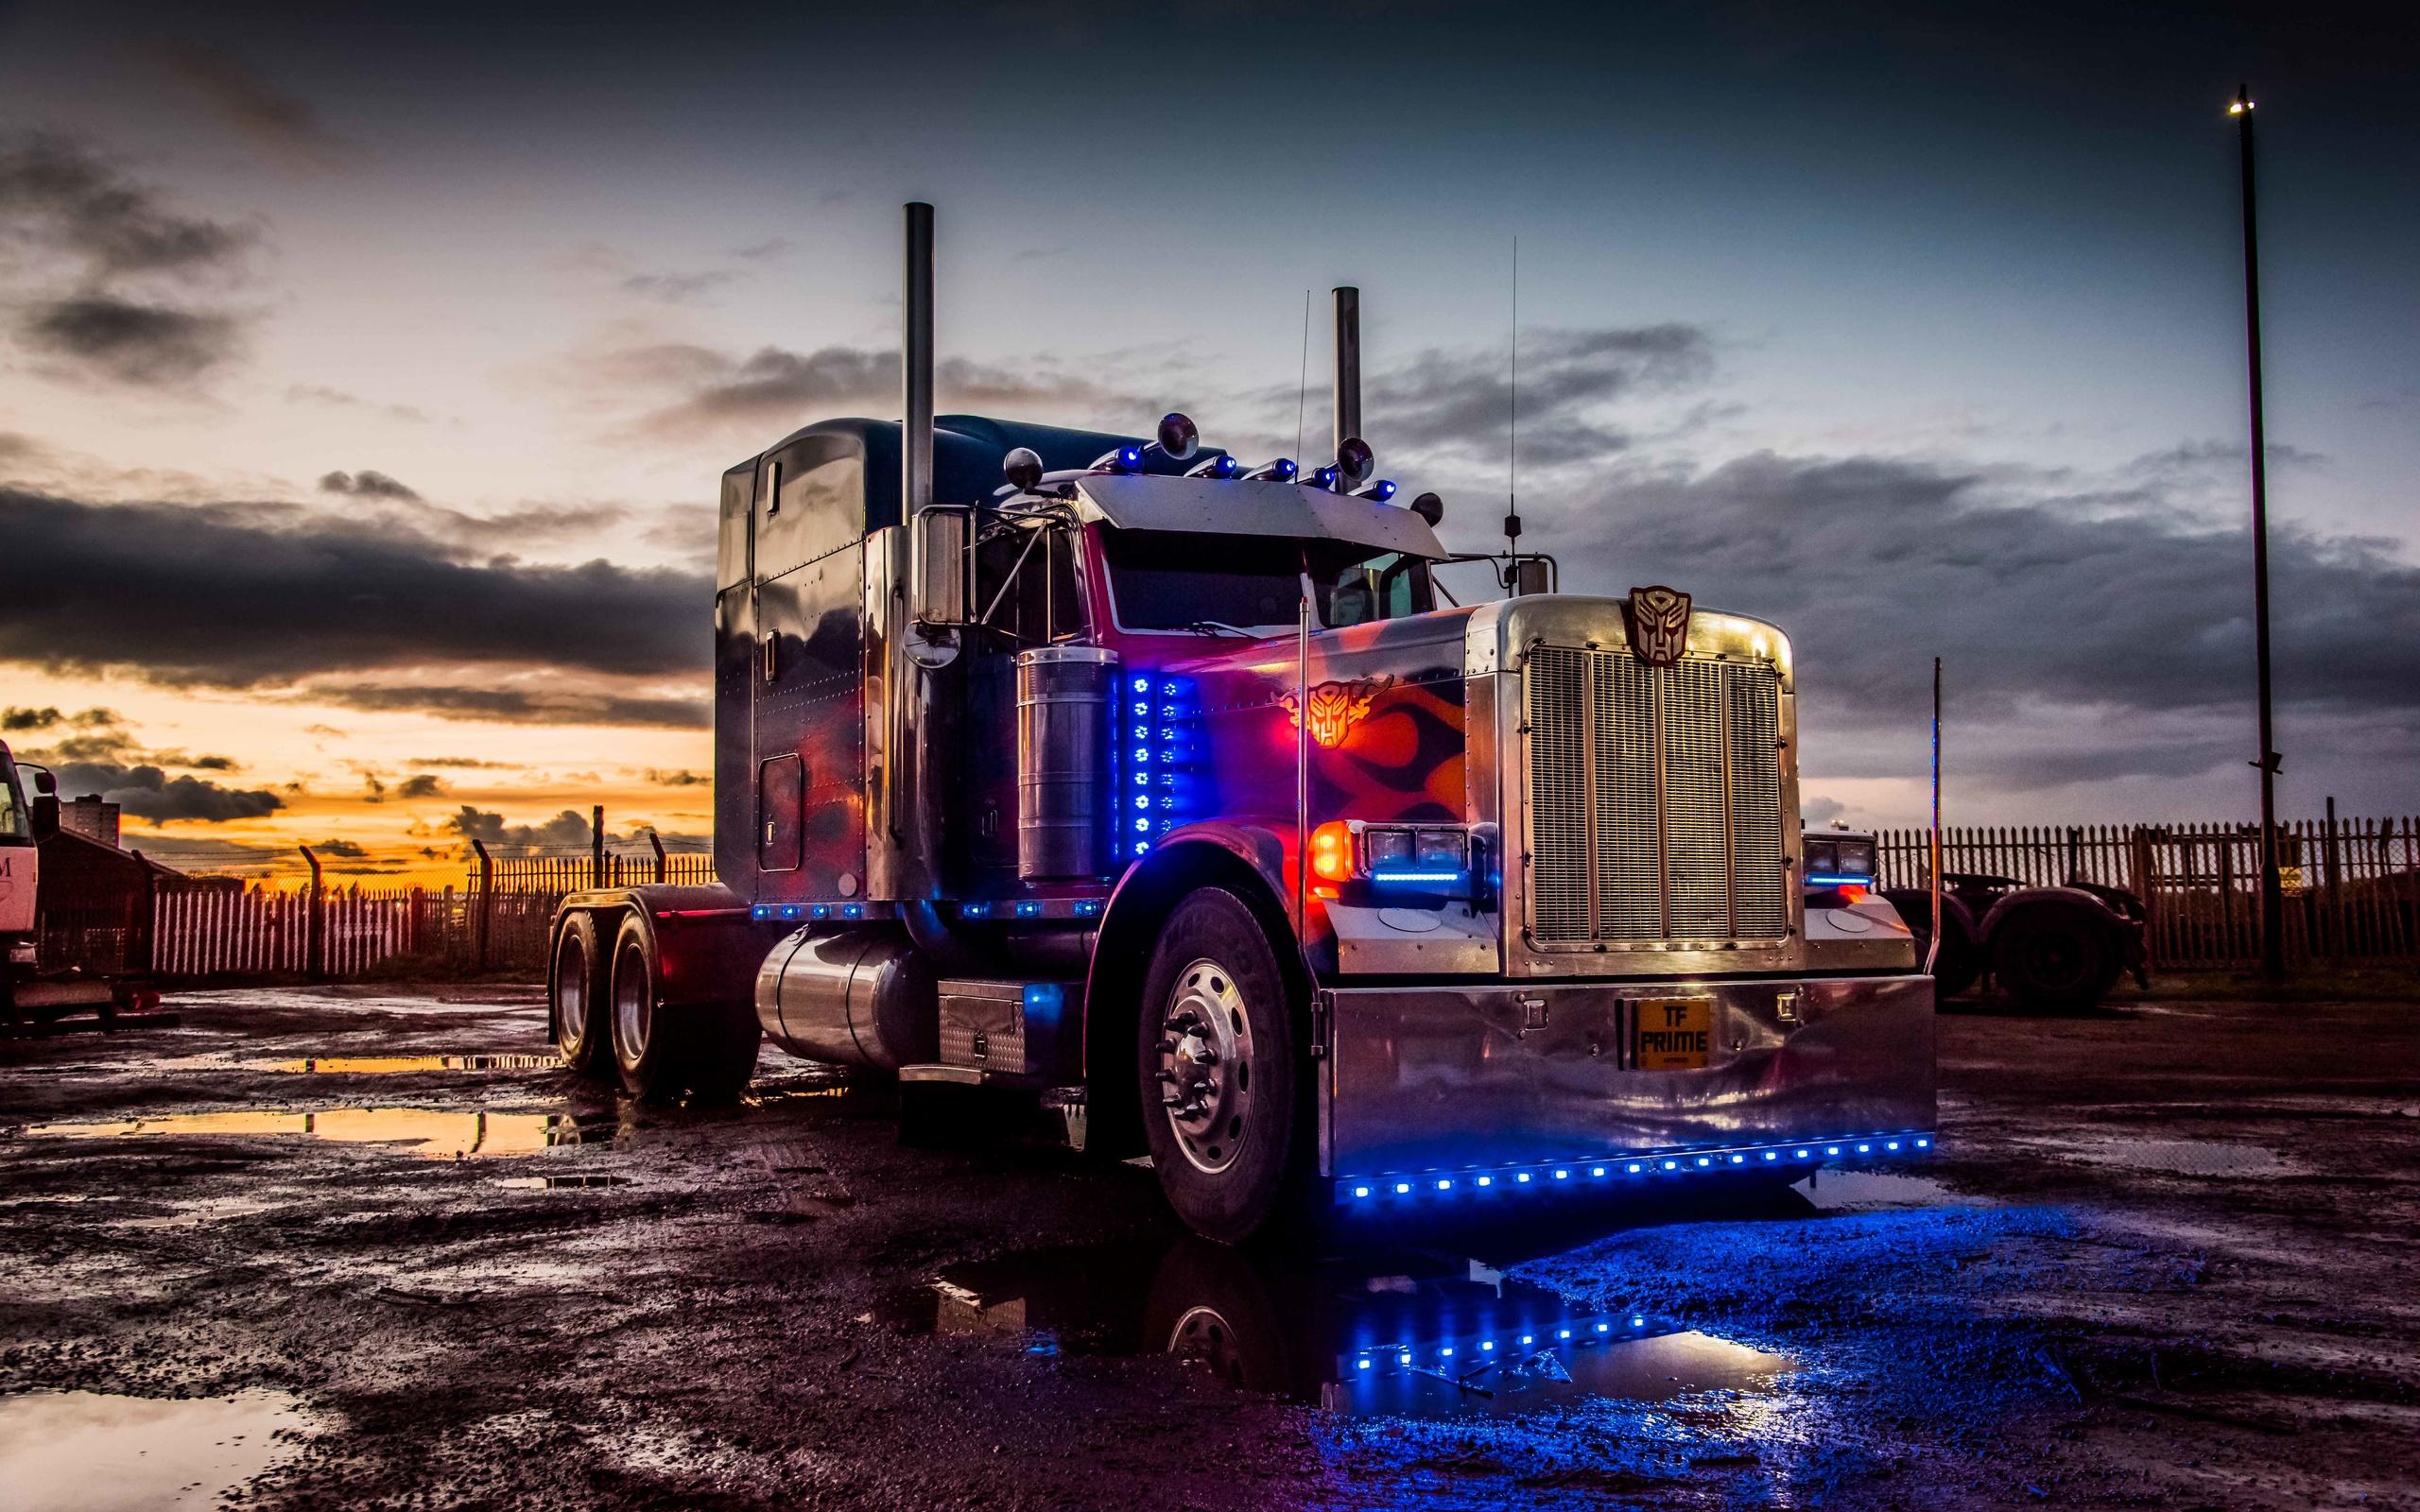 картинки крутых грузовиков ненавидим моралфагами